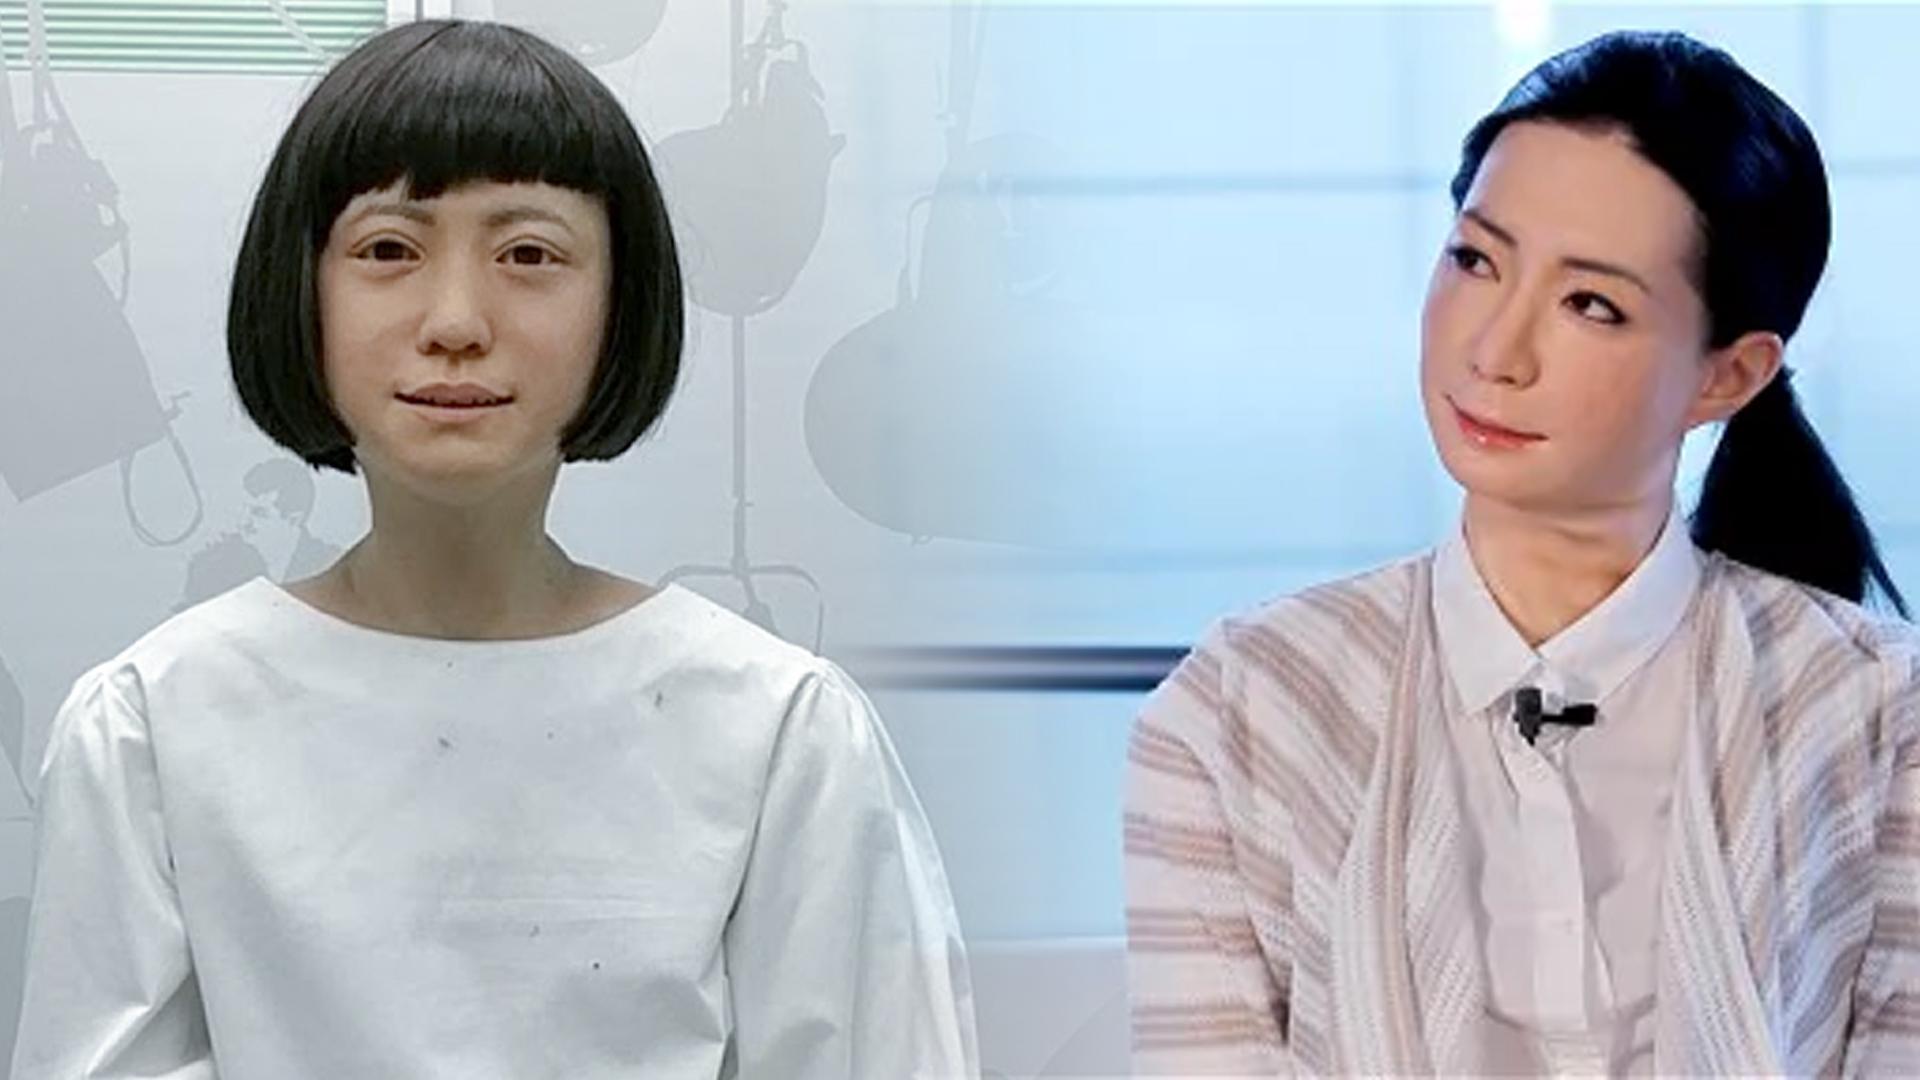 saul ameliach - futuro - robots